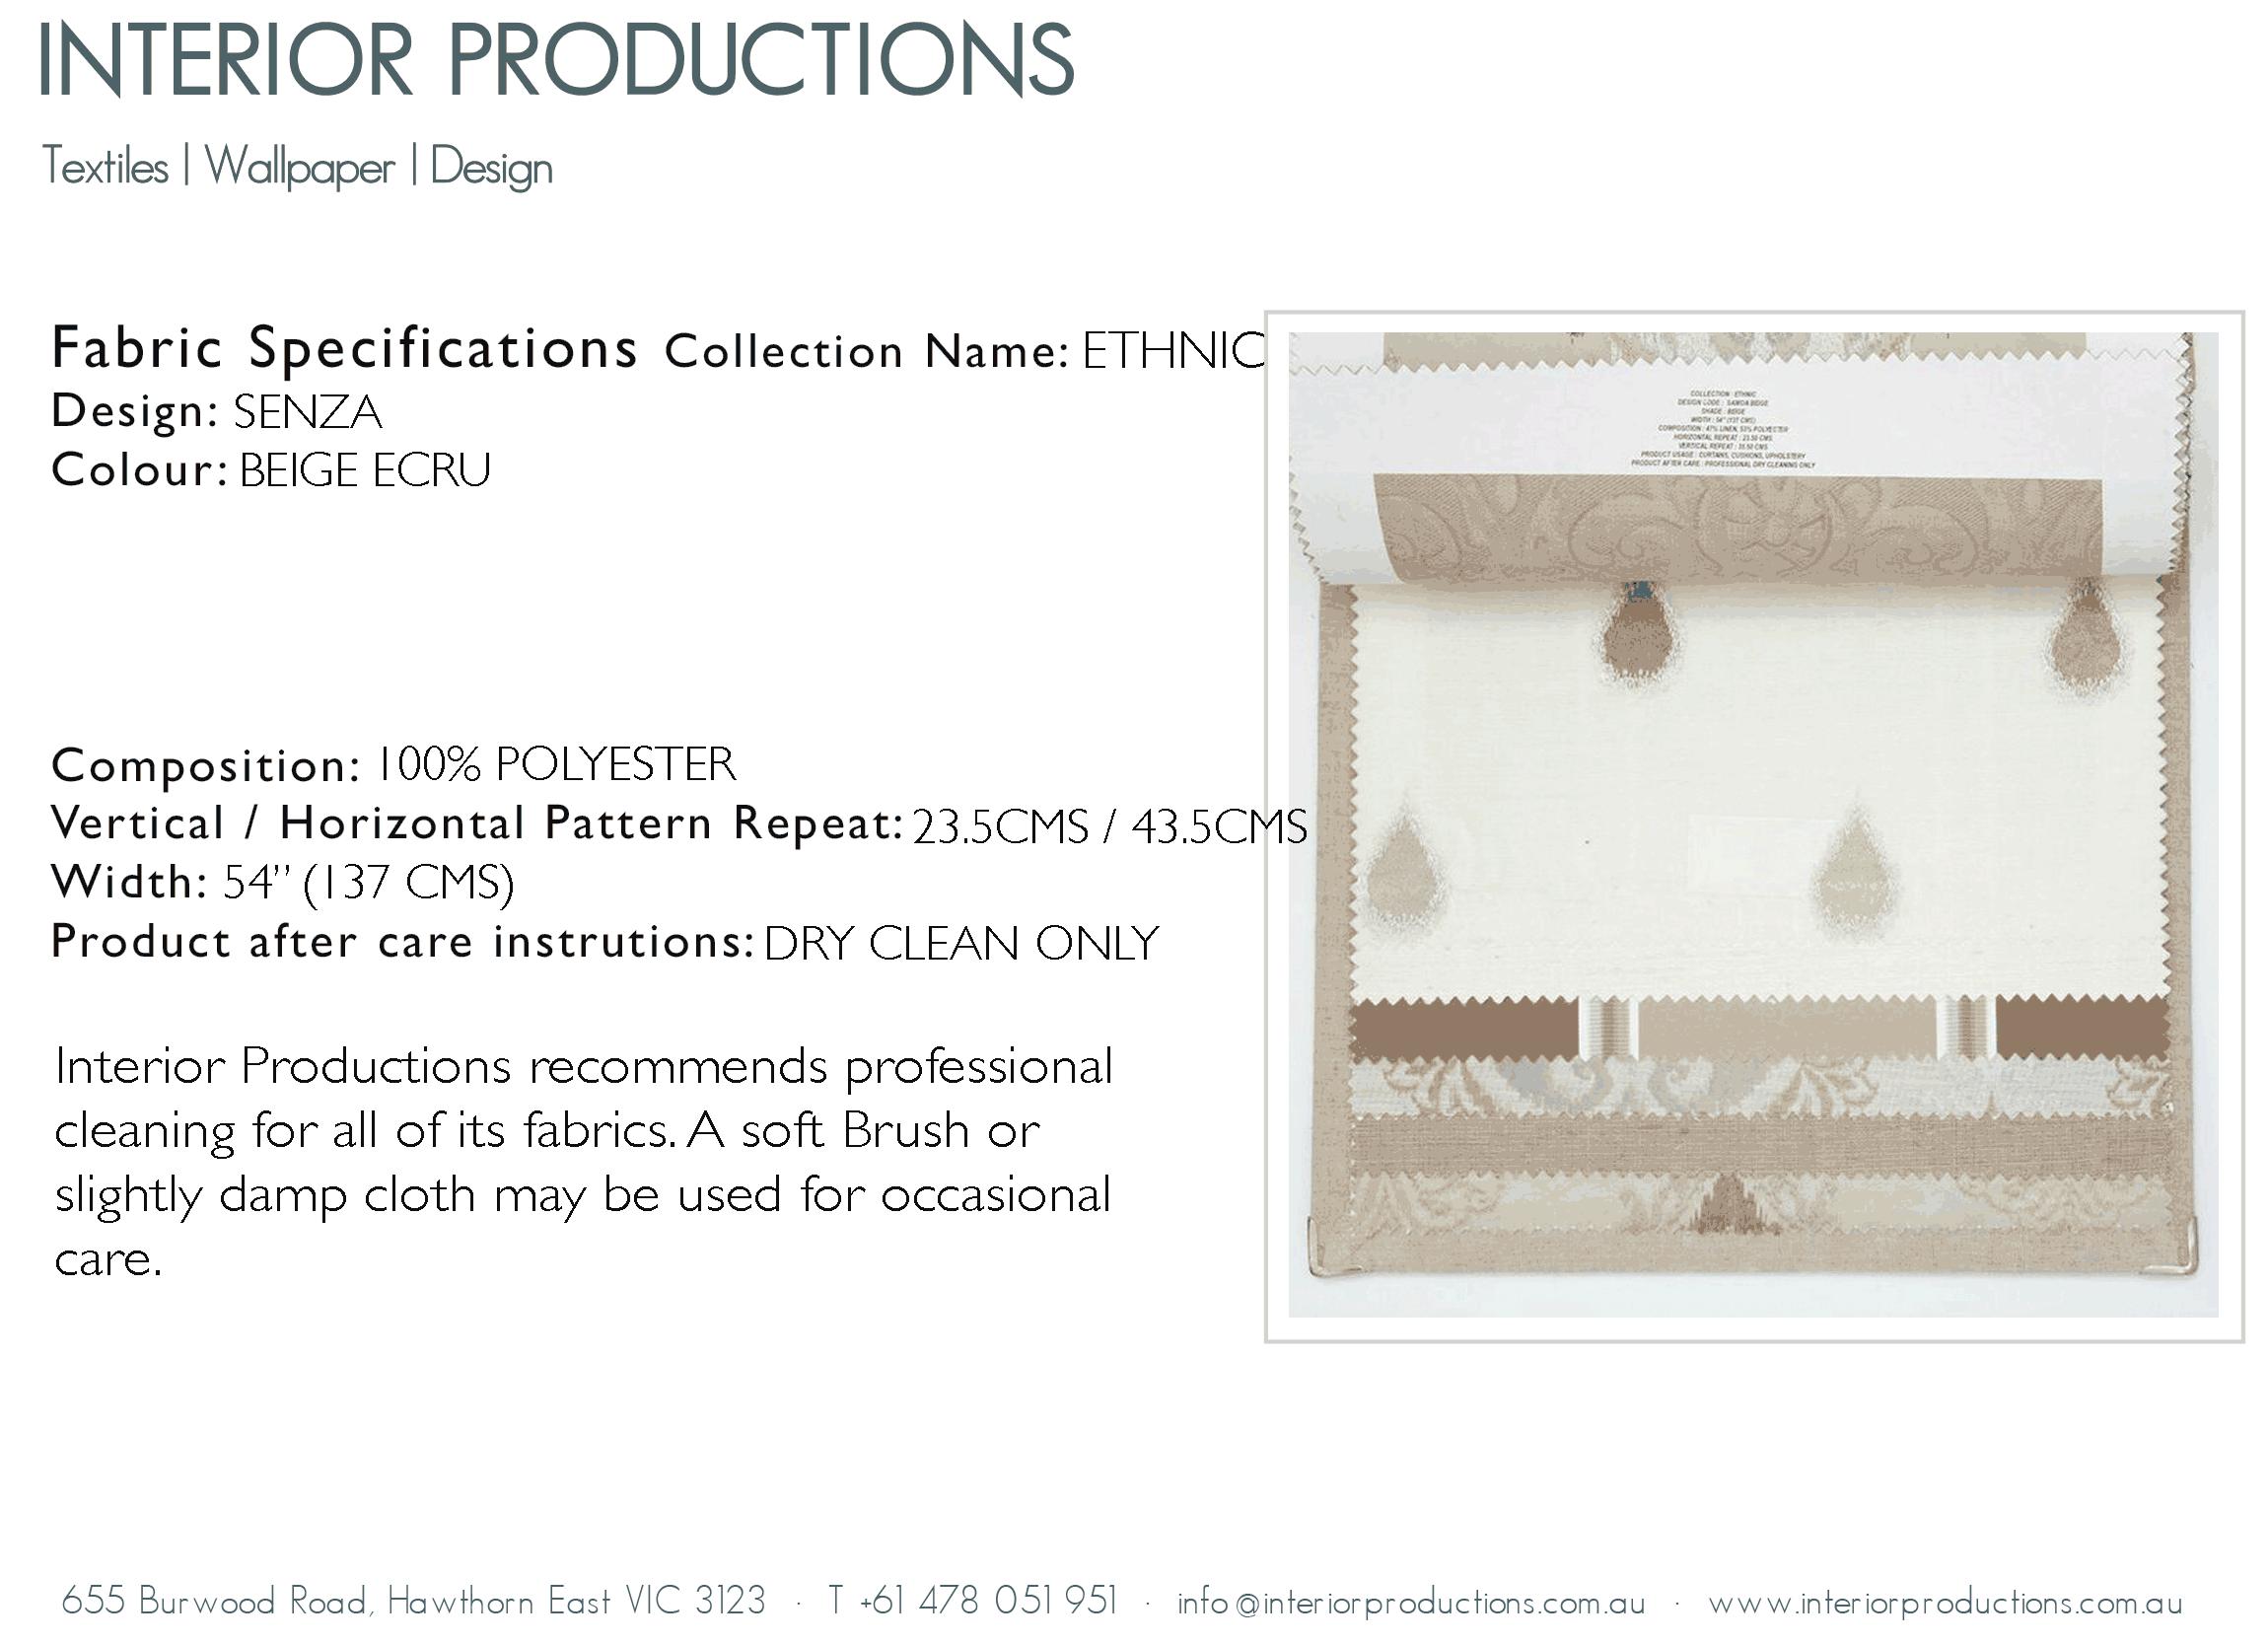 interior_productions_SENZA---BEIGE-ECRU